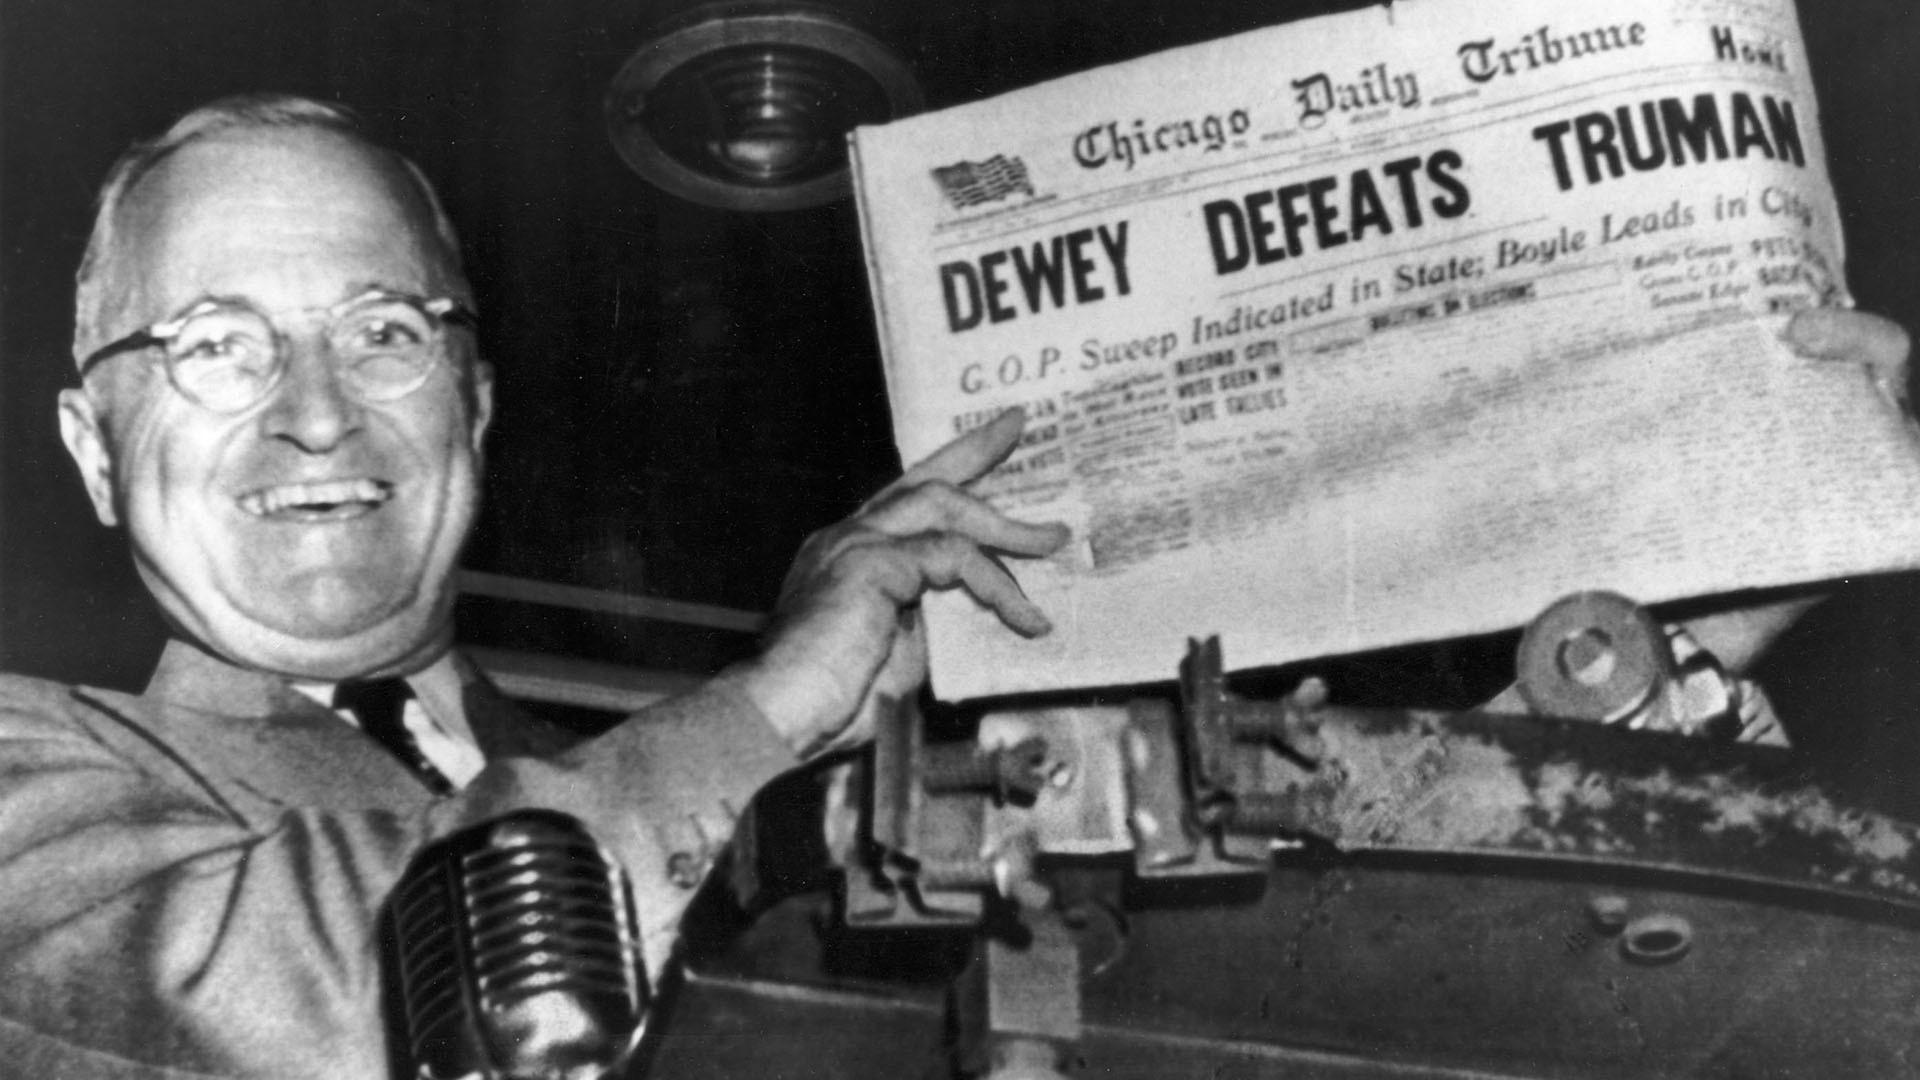 ct-dewey-defeats-truman-photo-20161020